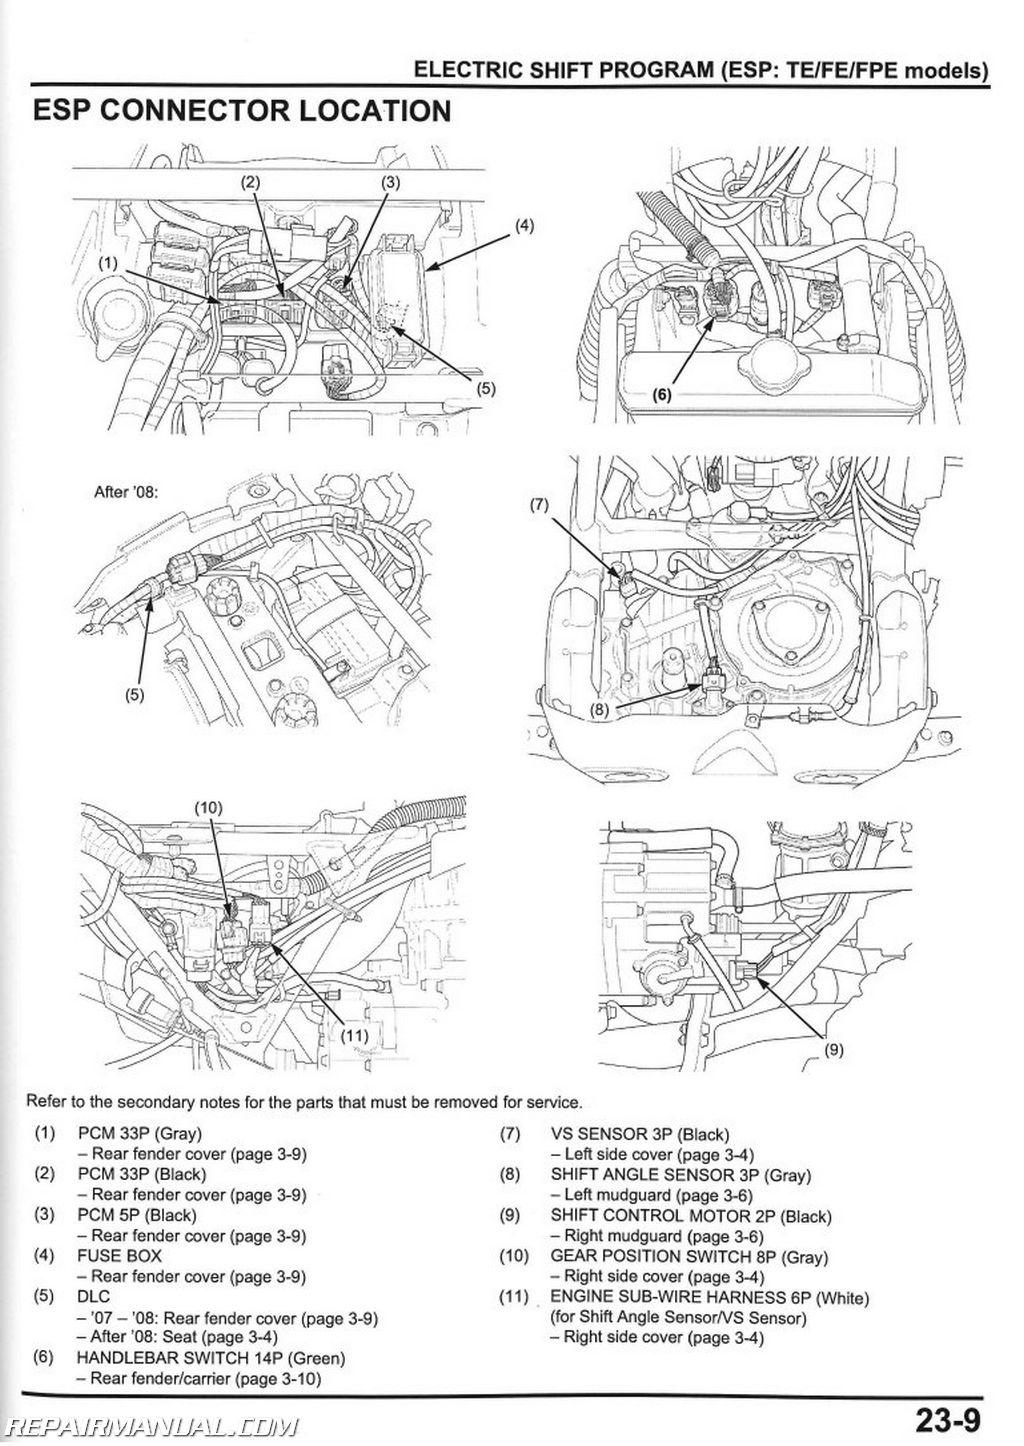 [DIAGRAM_5NL]  43CADB 2013 Honda Rancher Service Manuals   Wiring Library   2007 Honda 420 Wiring Schematic      Wiring Library